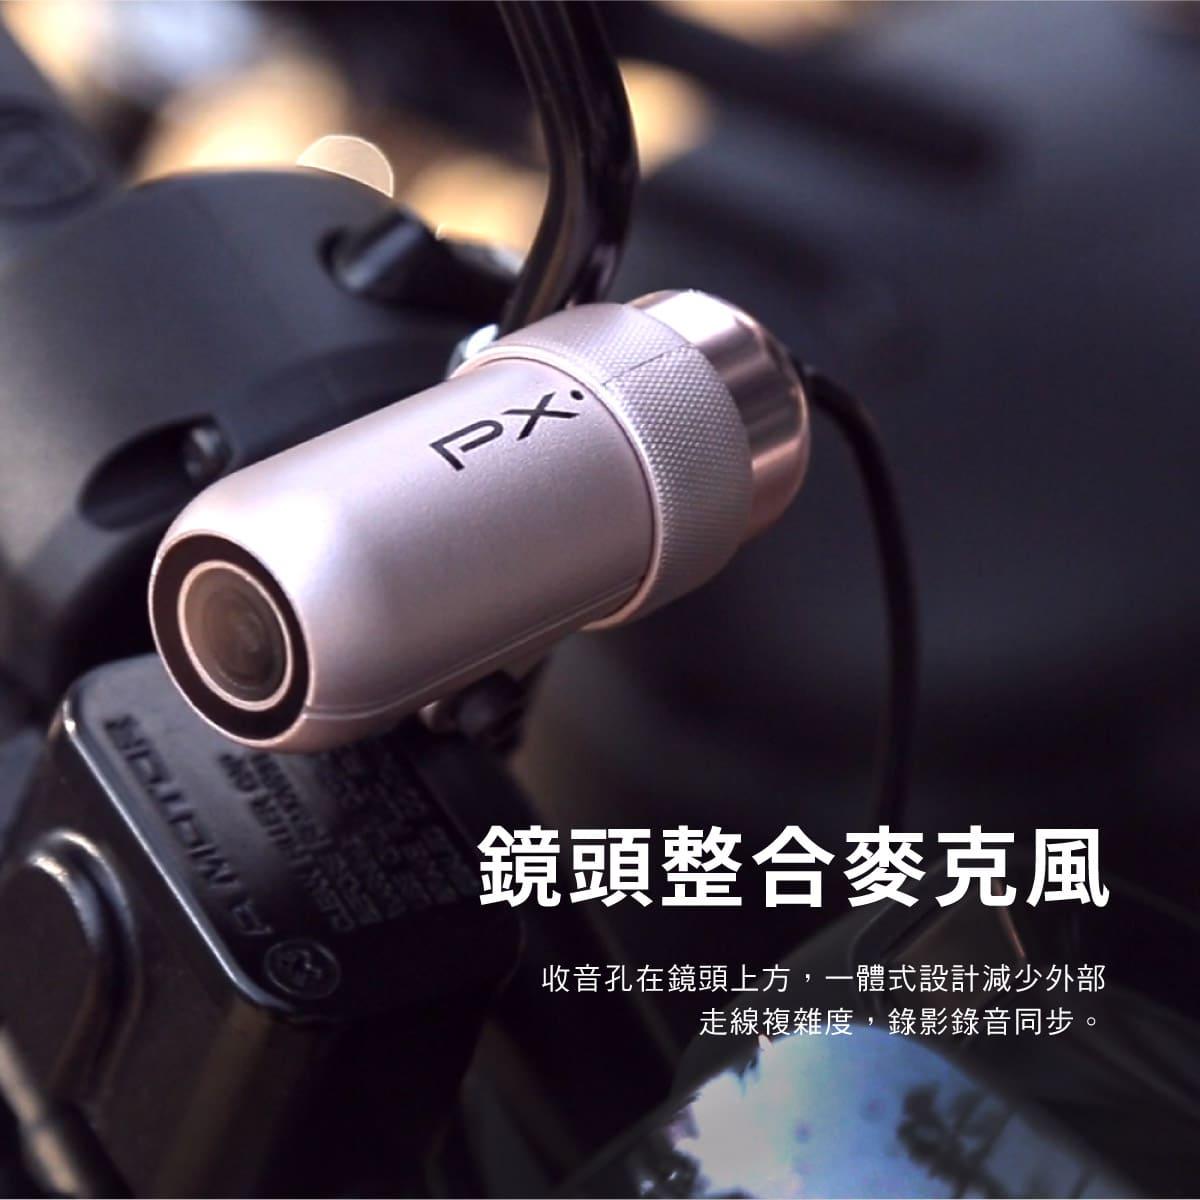 proimages/product/Bike_Cam/B53U_B63U/20.jpg